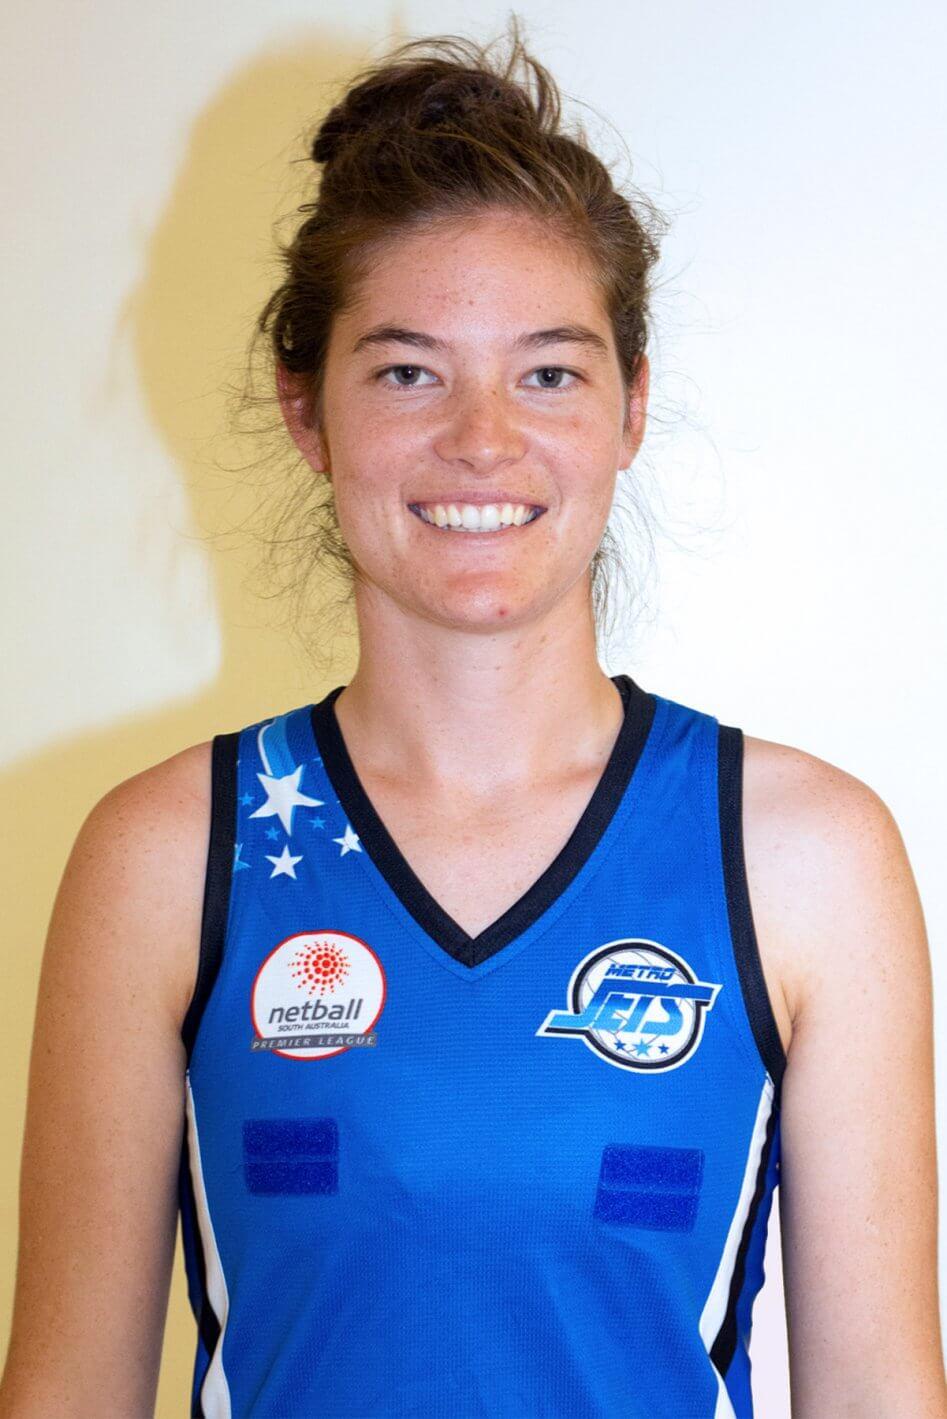 Kimberley Batley